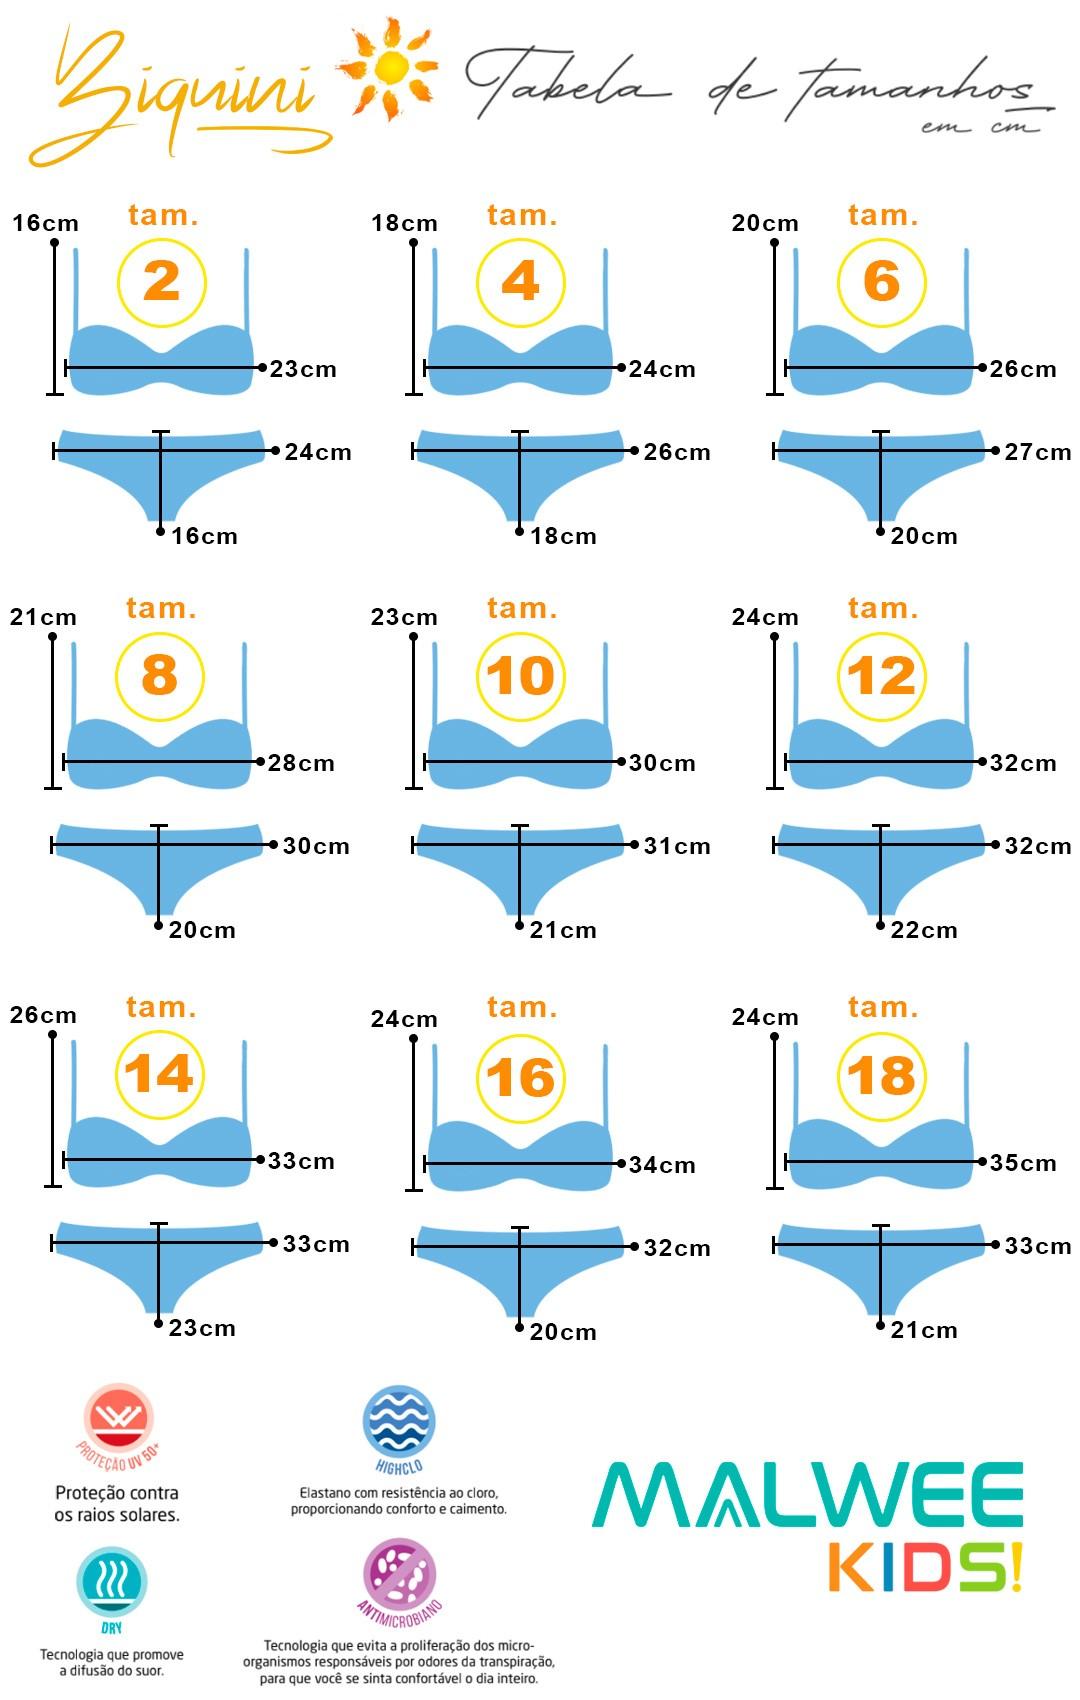 Biquini Infantil Proteção UV 50+ Verde Enjoy - Malwee: Tabela de medidas